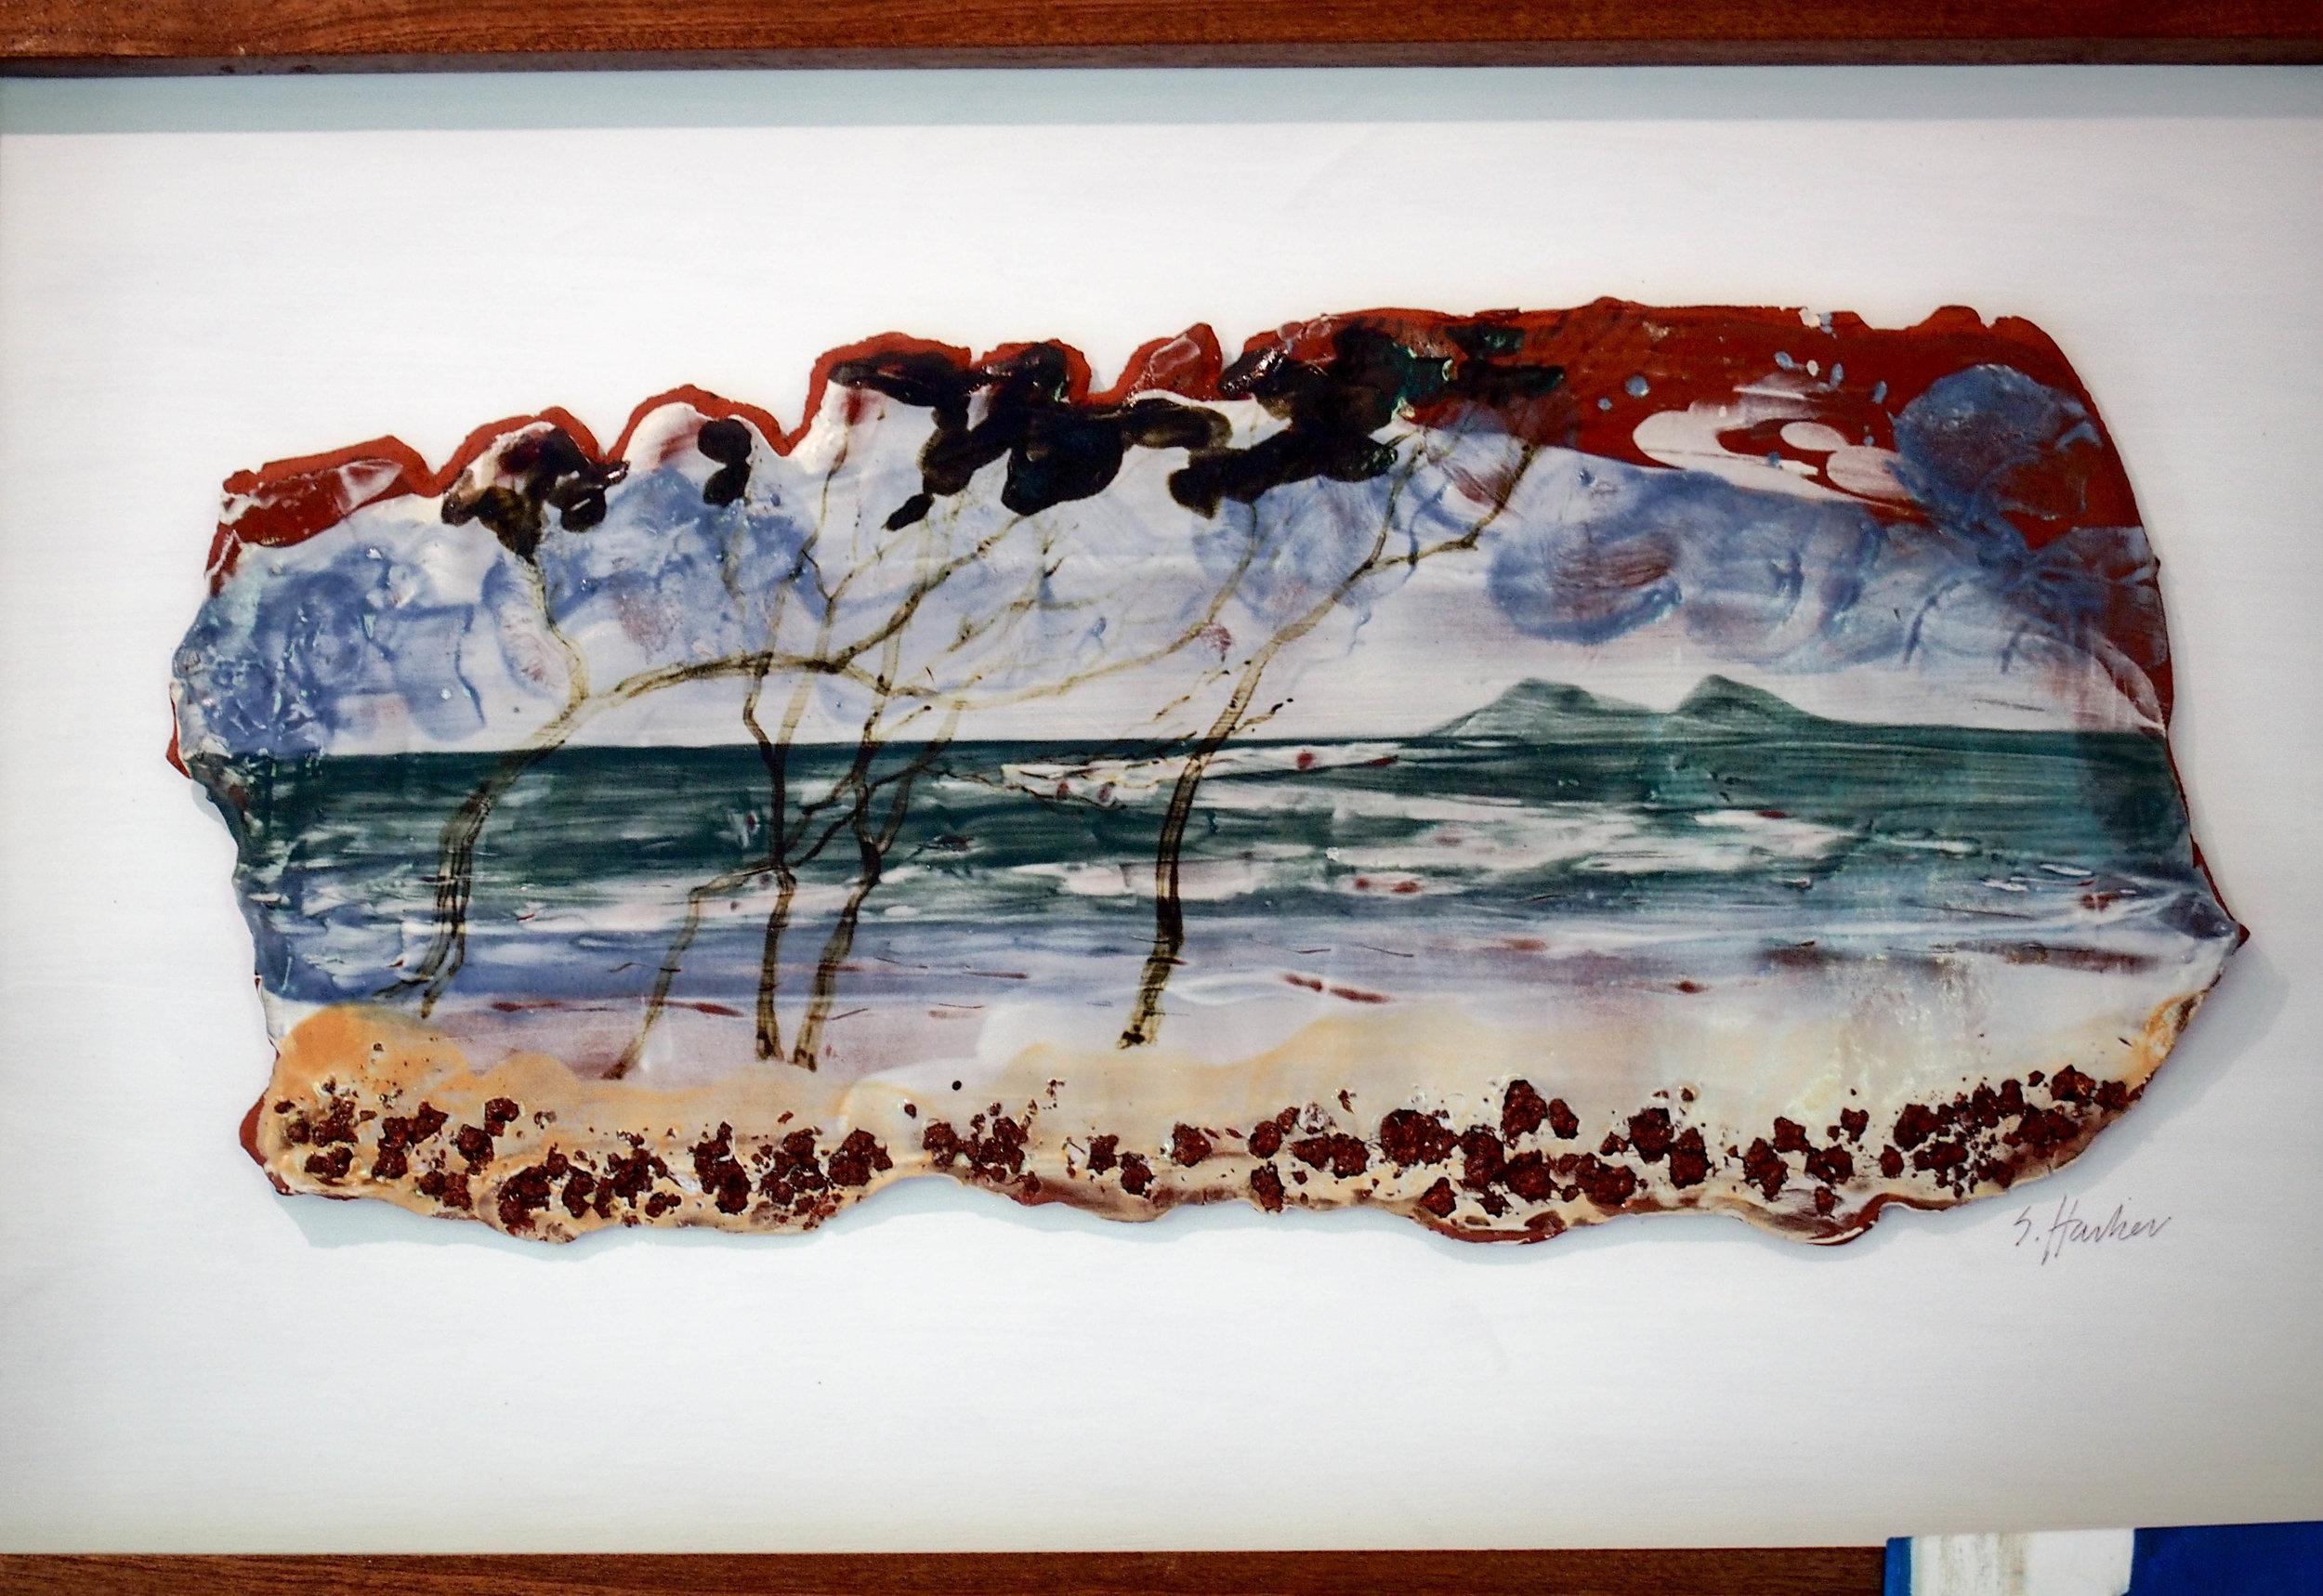 Seascape by Sallie Harker on ceramics. Photo by Jennie Ritchie.